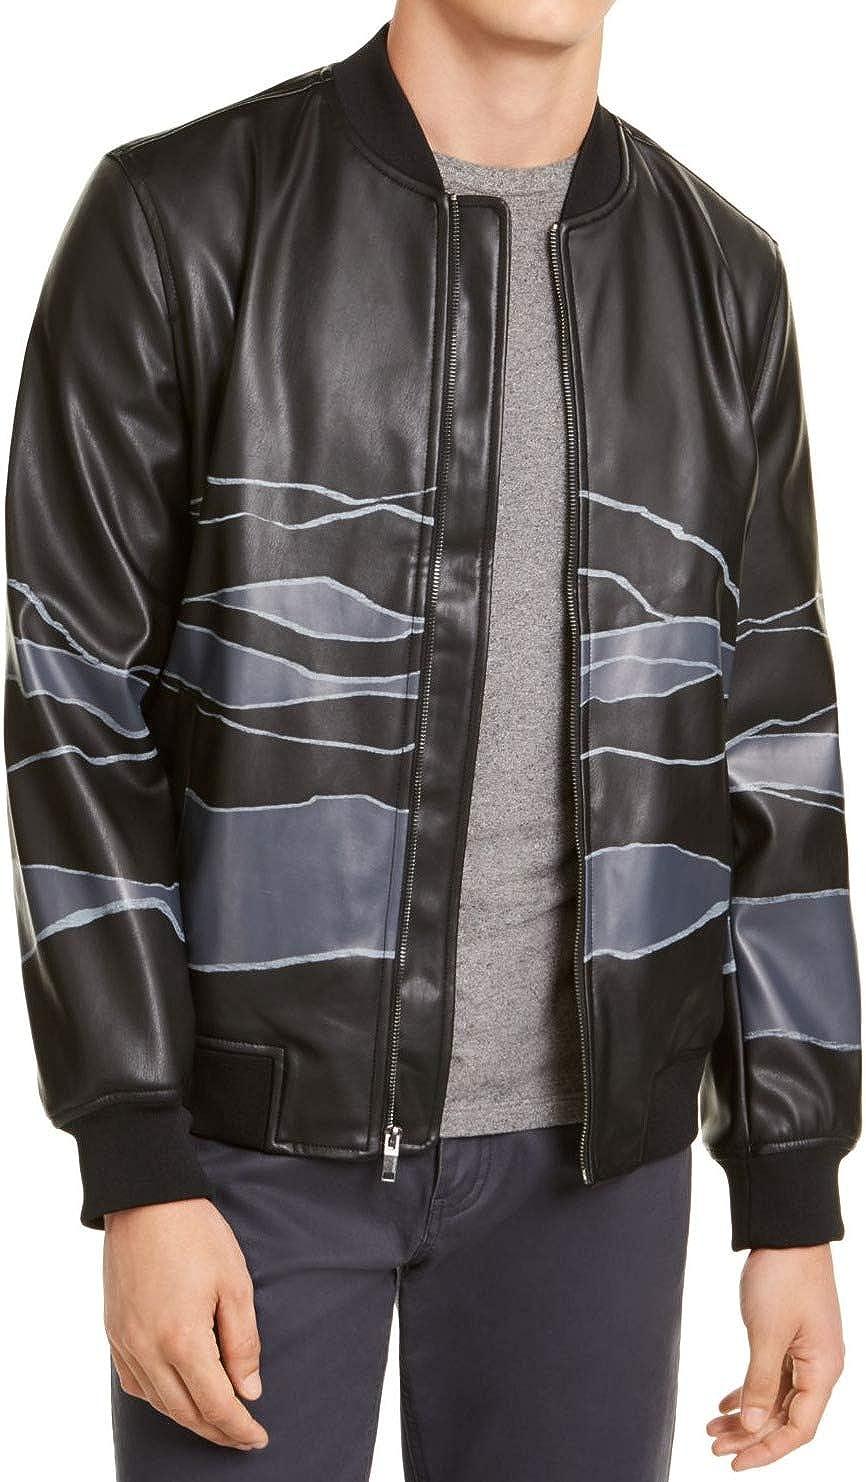 ALFANI Mens Black Color Block Bomber Faux Leather Jacket M